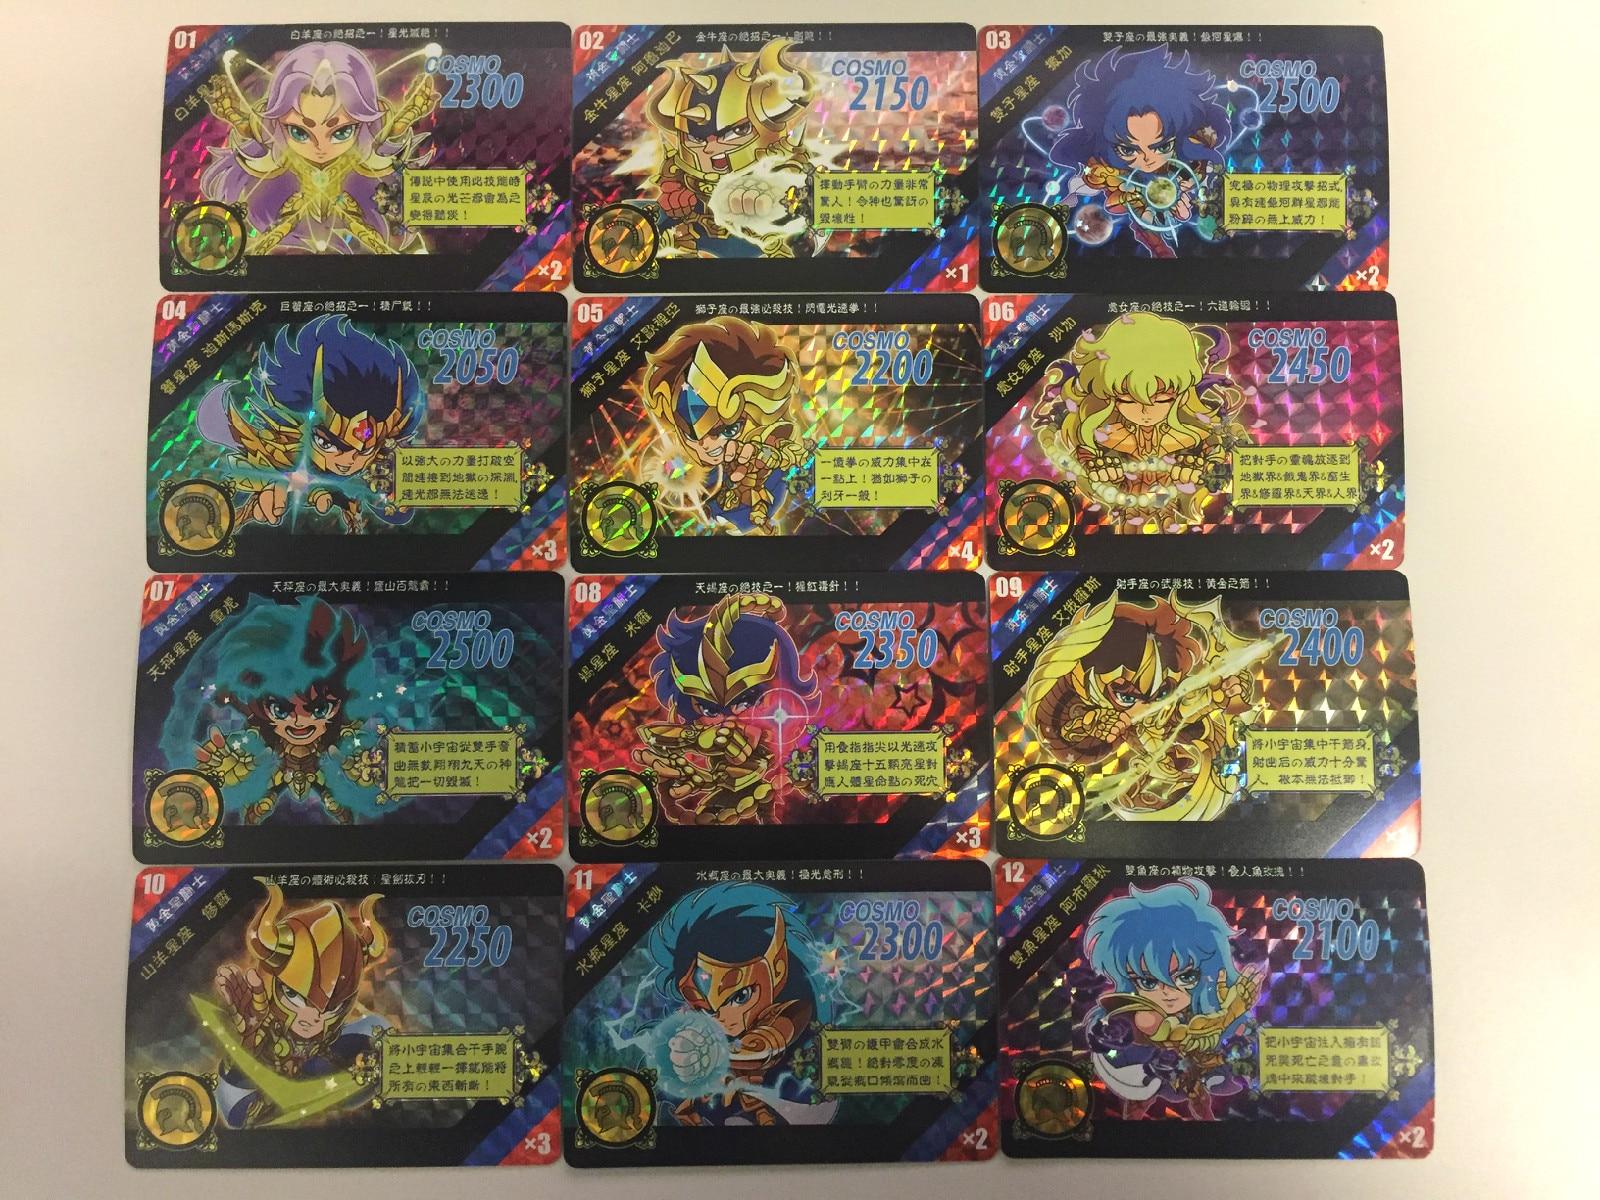 12pcs/set Saint Seiya Seitoushi Seiya Seiiki Juunikyuu Hen Awaken Q Version Toys Hobby Collectibles Game Collection Anime Cards